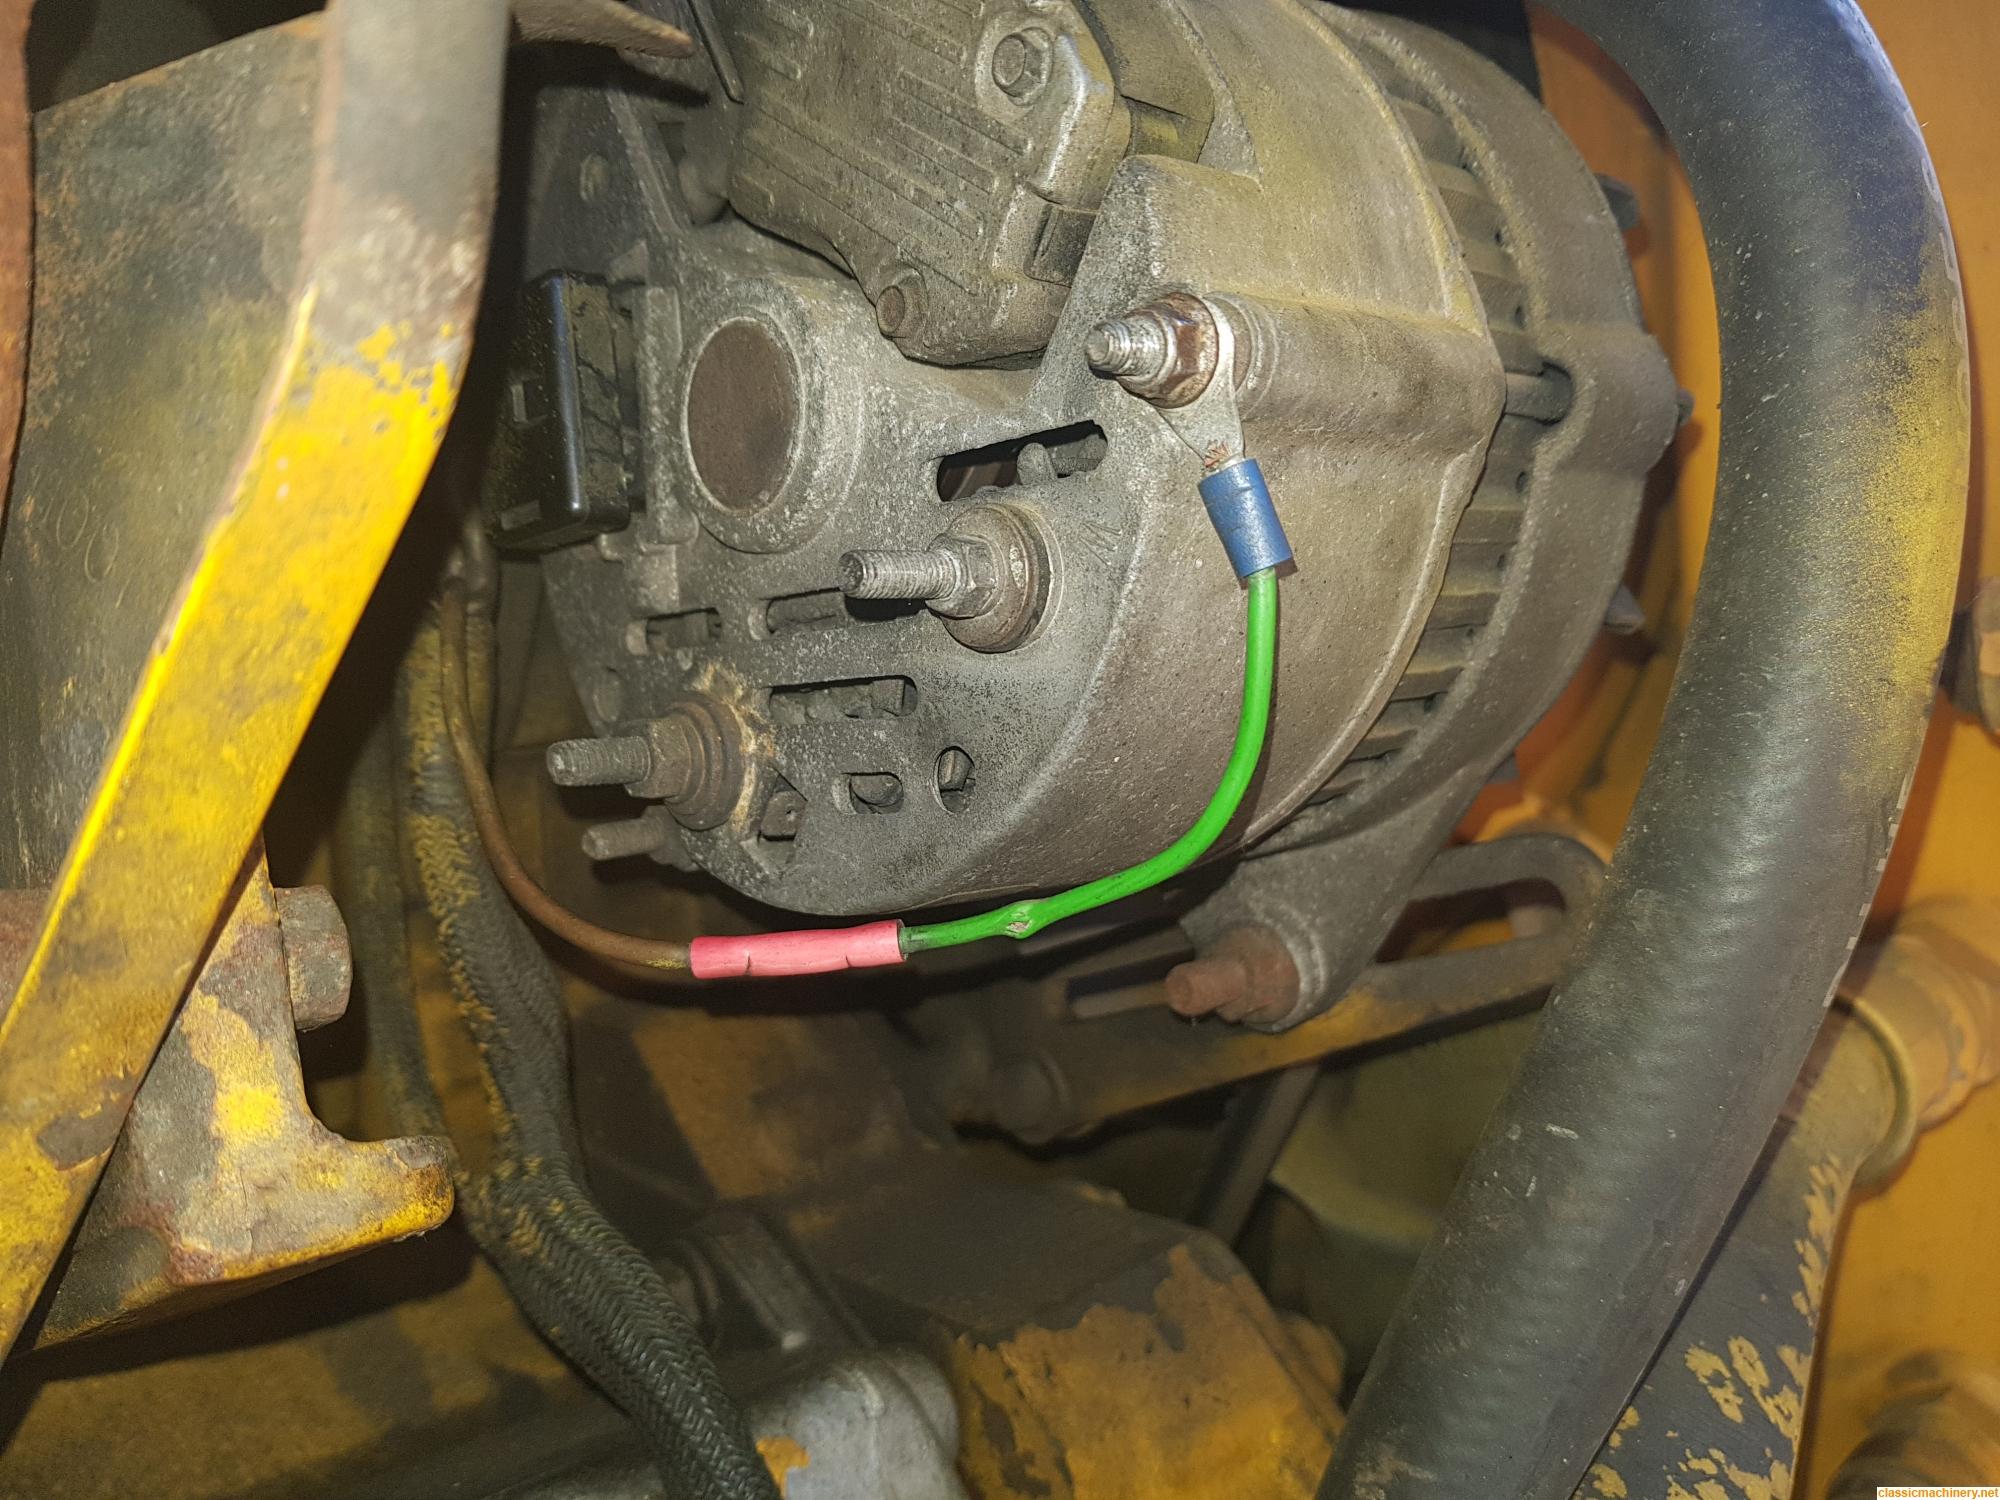 Jcb Alternator Wiring - Wiring Diagram Bookmark on